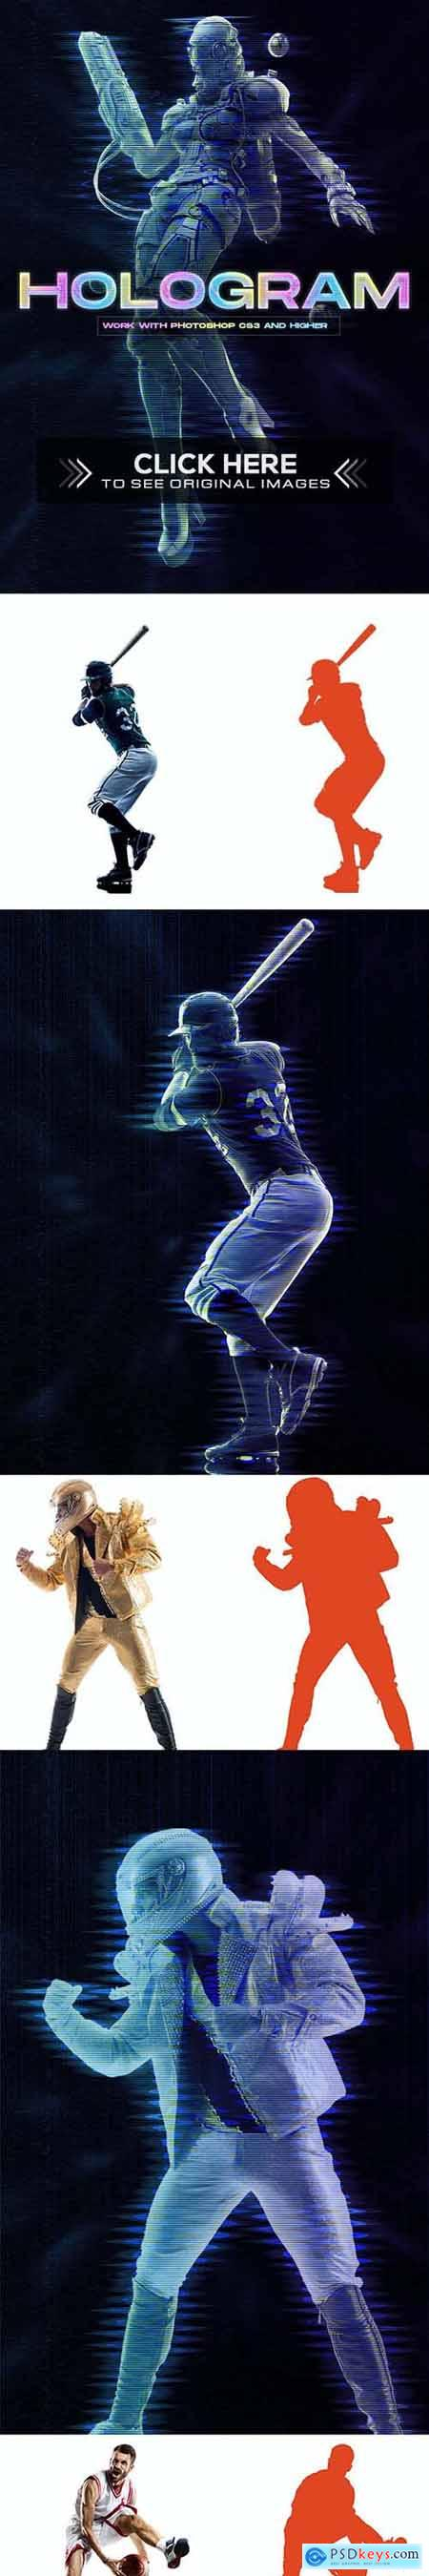 Hologram Photoshop Action 32056335